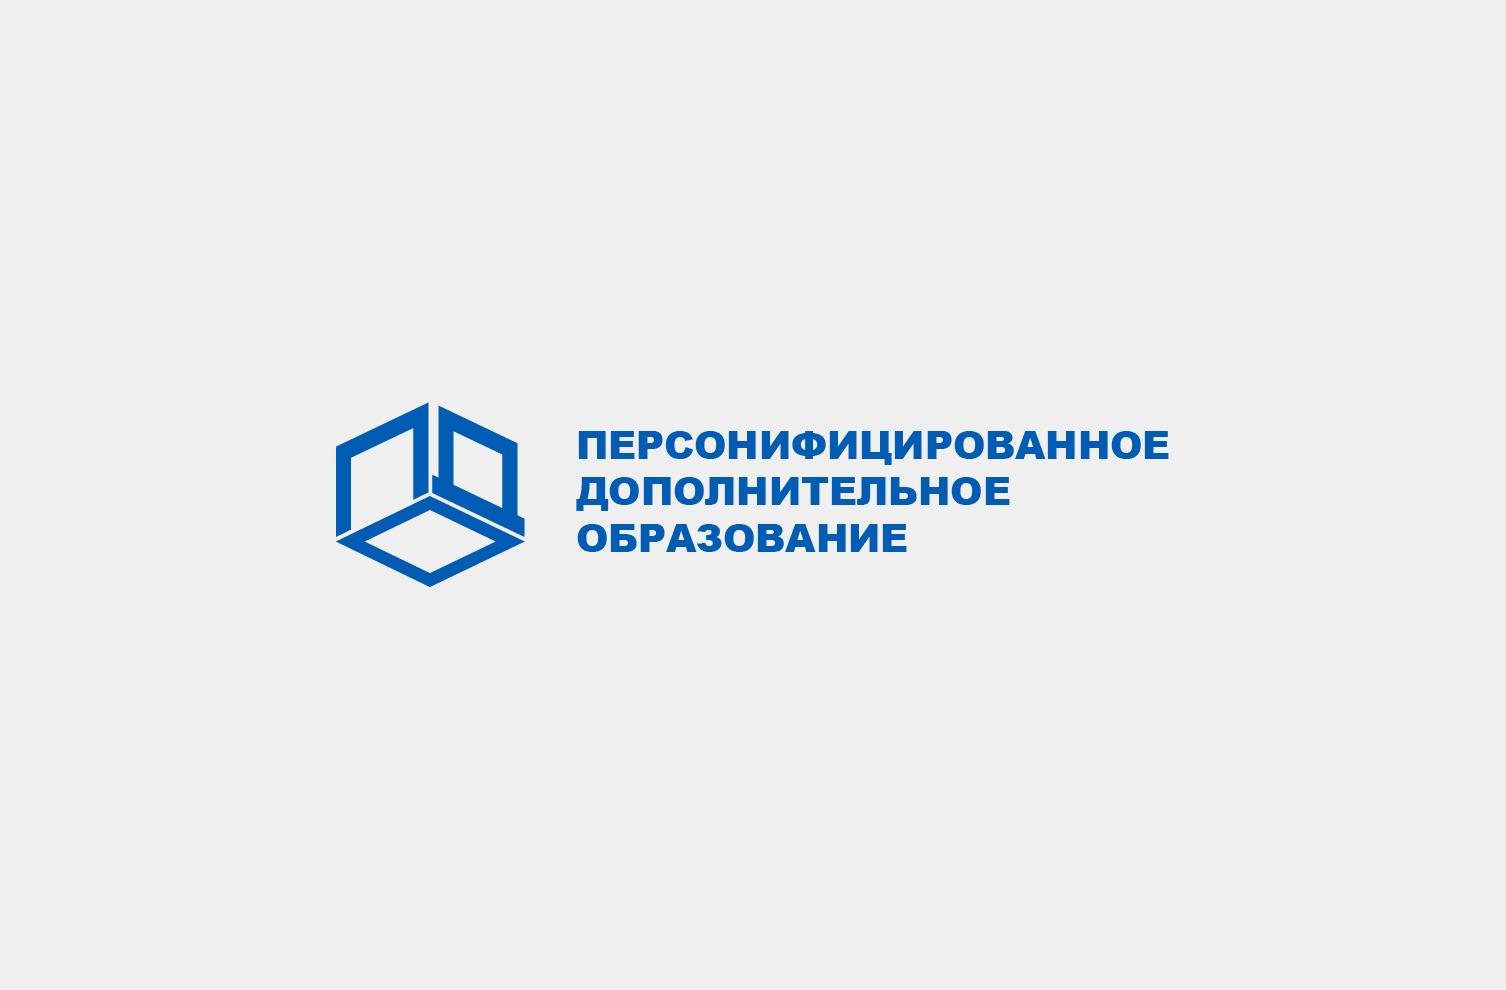 Логотип для интернет-портала фото f_3775a43d1789bba2.jpg